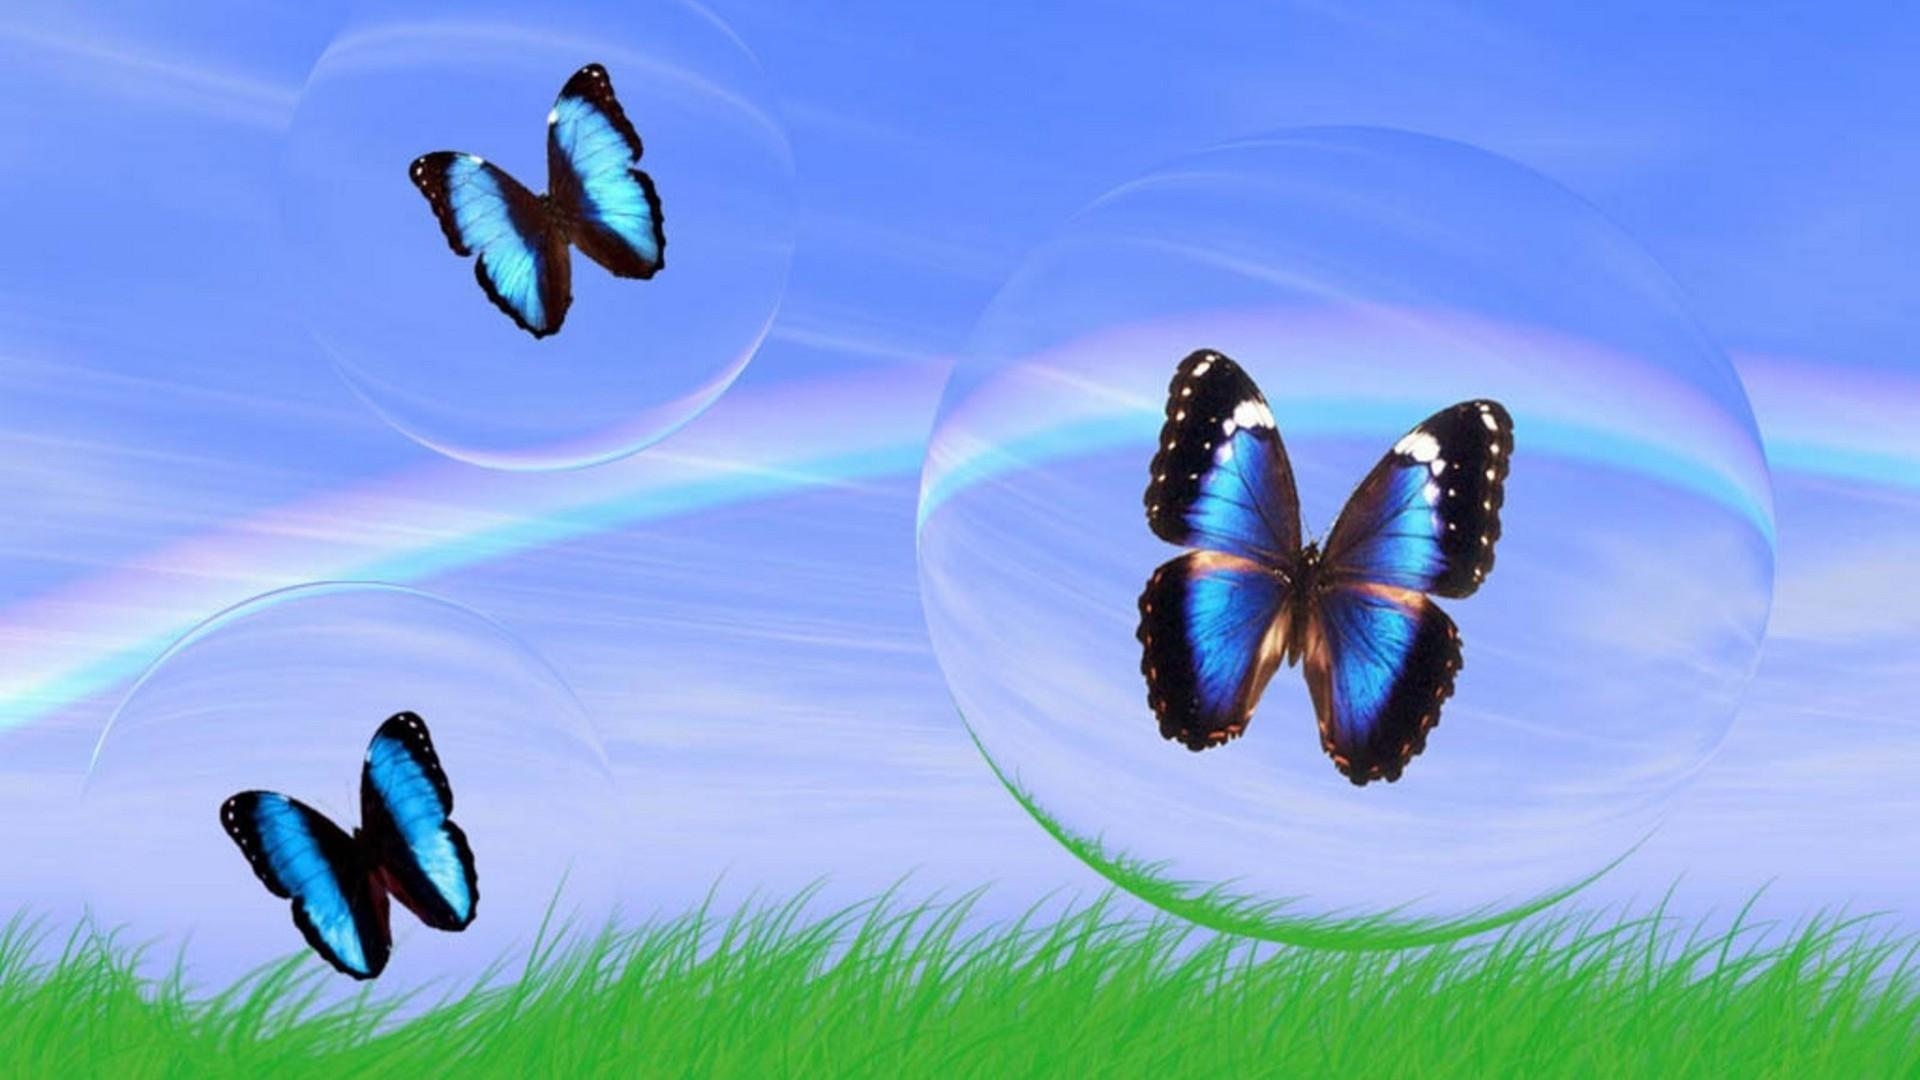 Start Download - Beautiful 3d Wallpaper Downloading , HD Wallpaper & Backgrounds